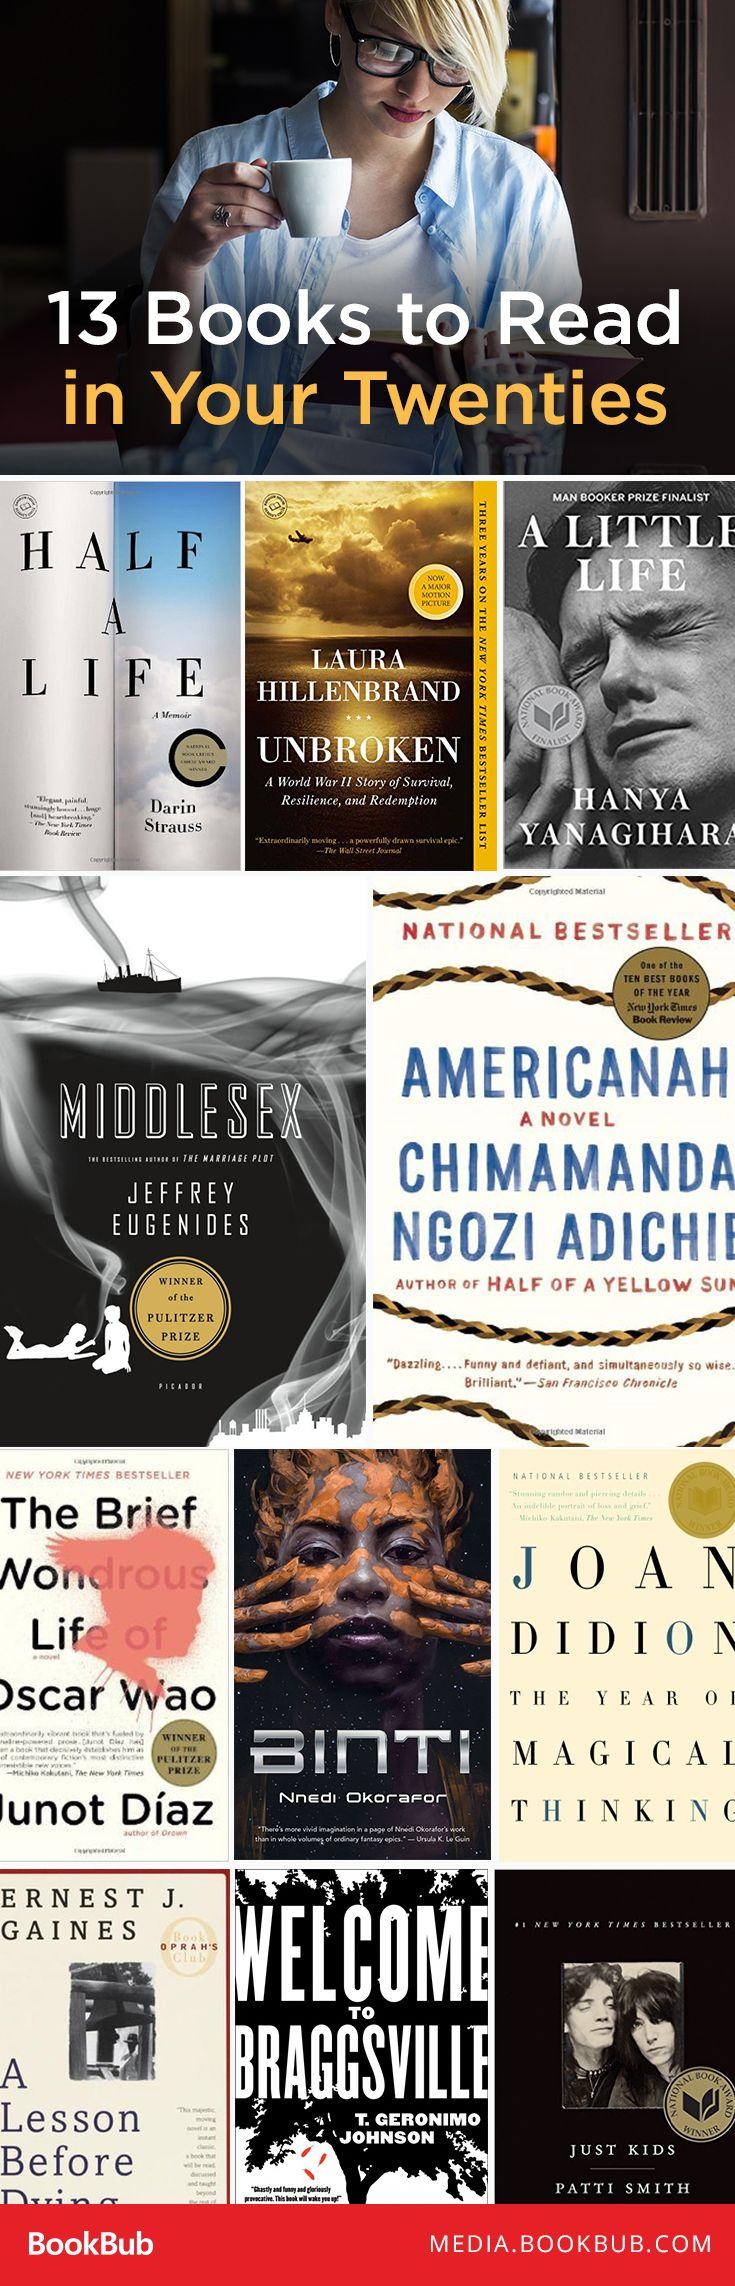 13 top books to read in your twenties.